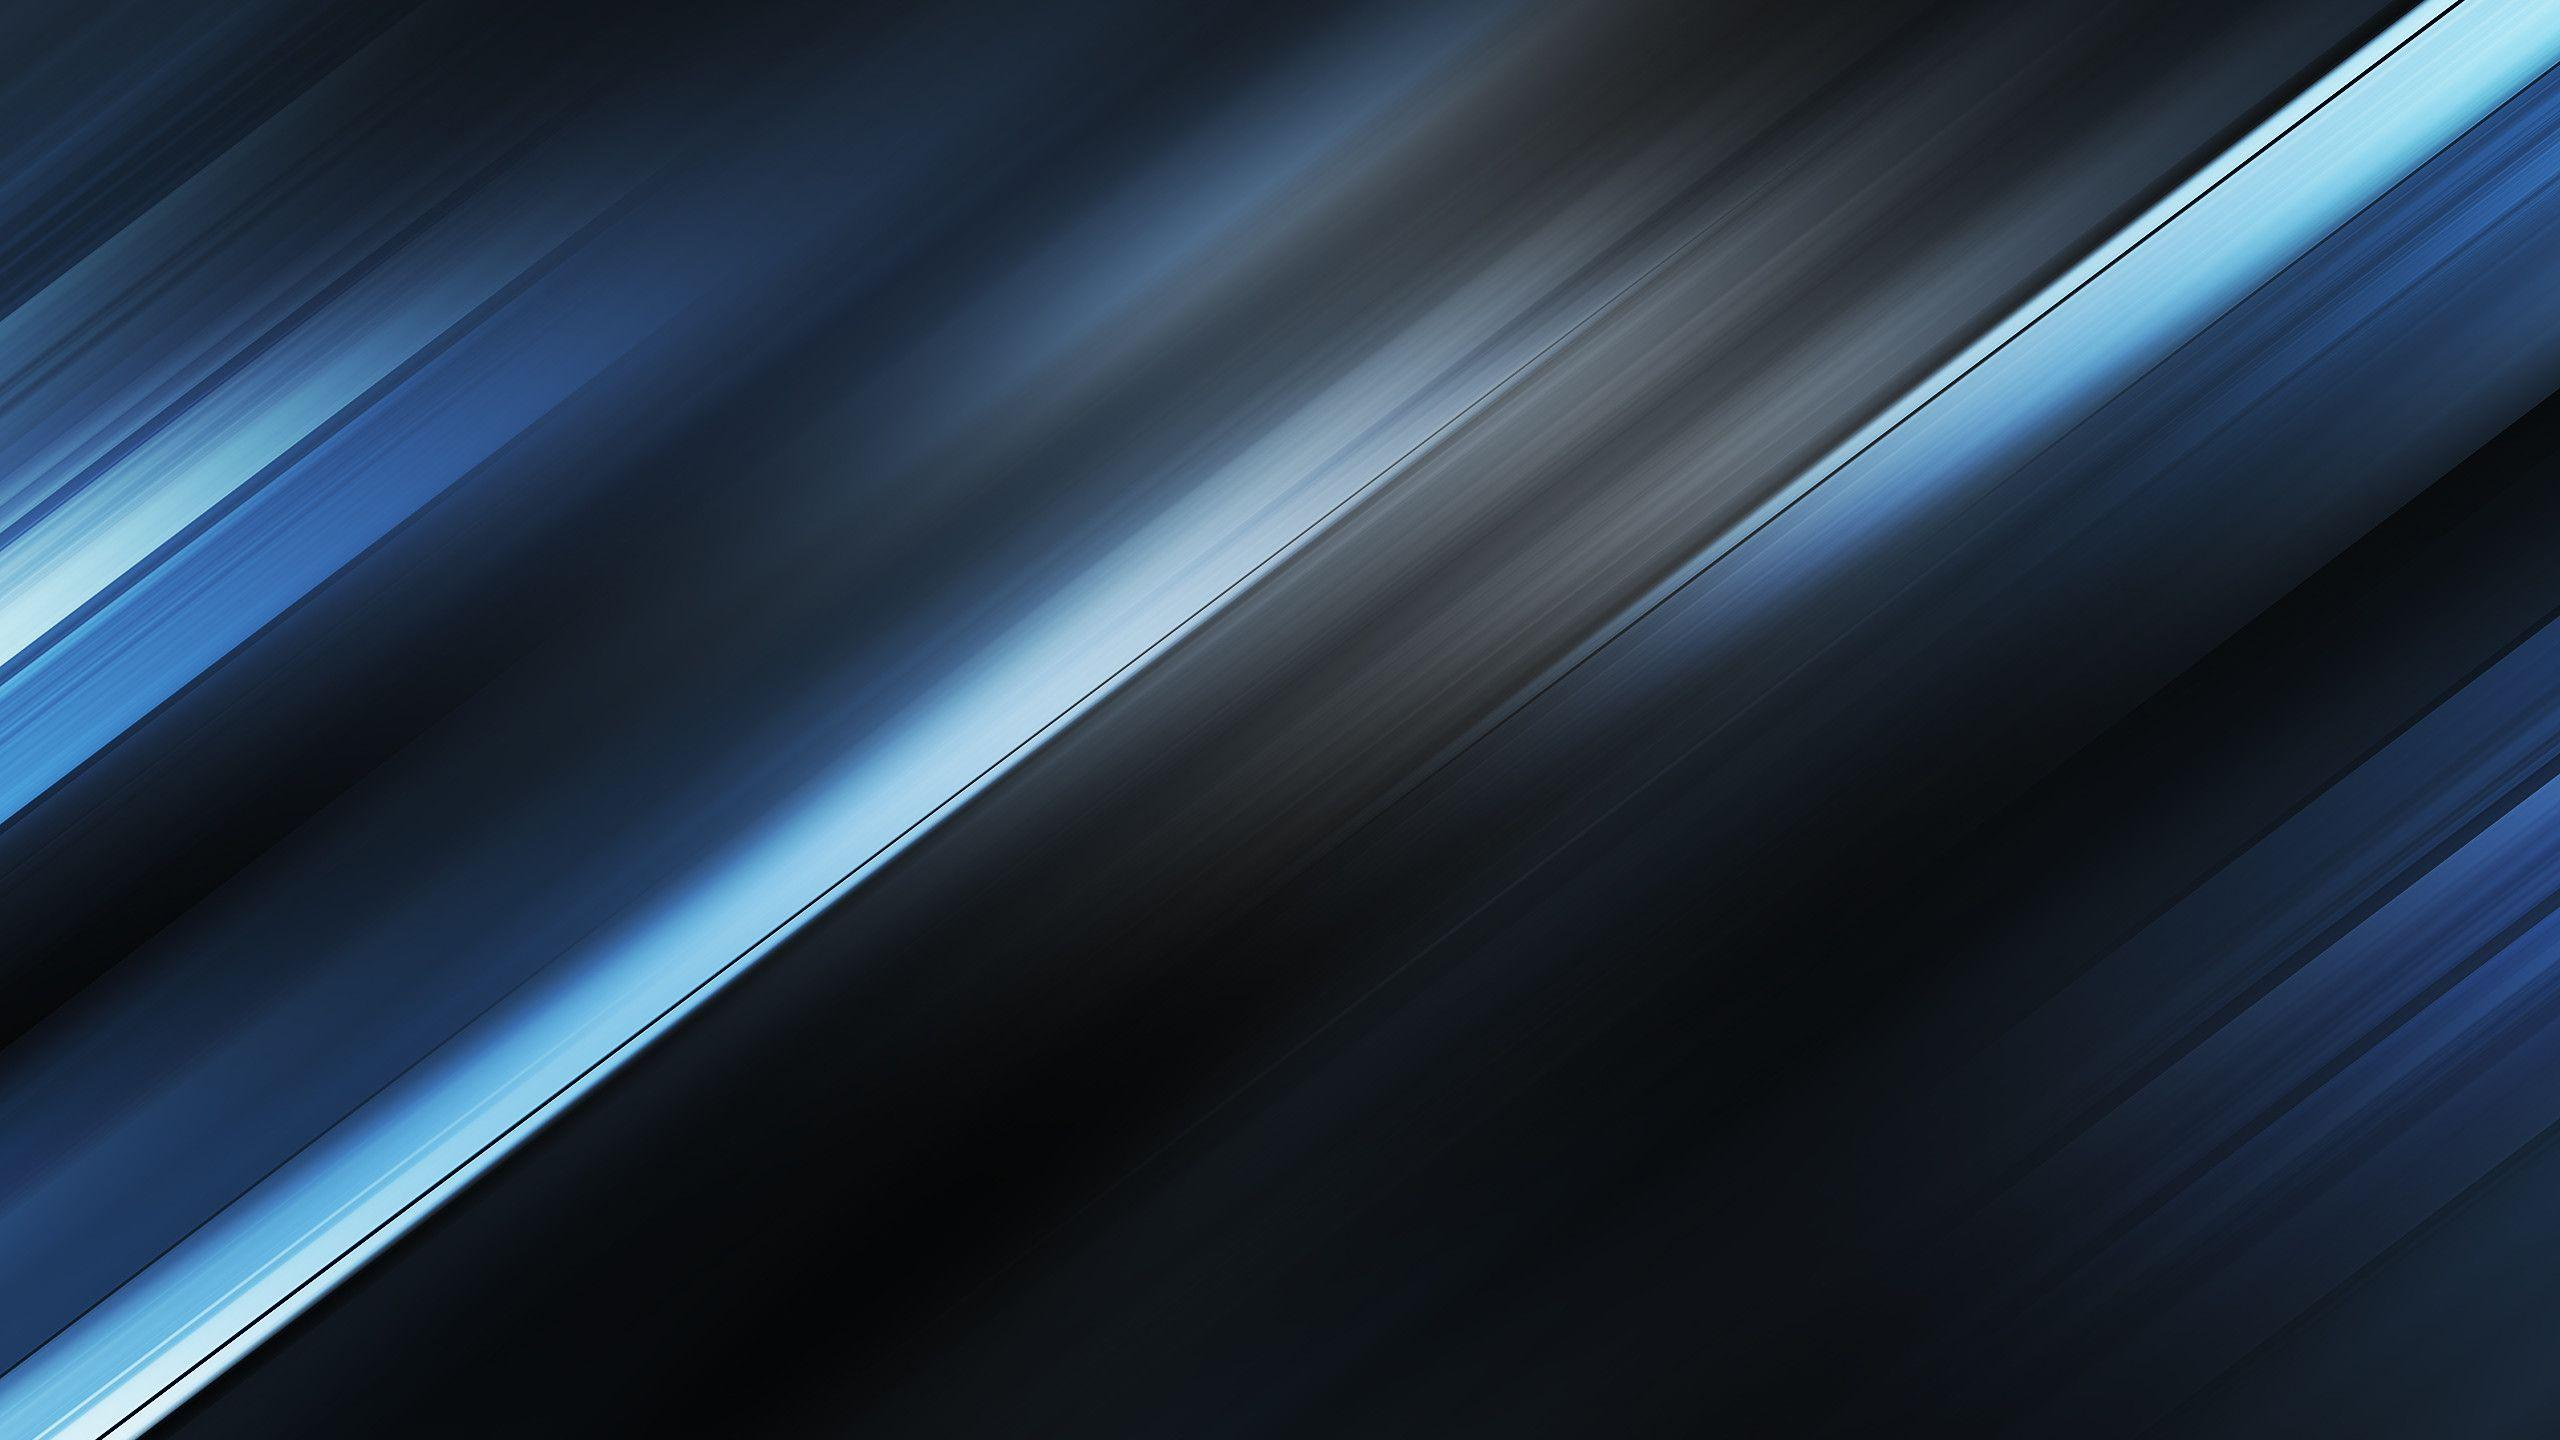 Blue Metallic Wallpaper 54 Images